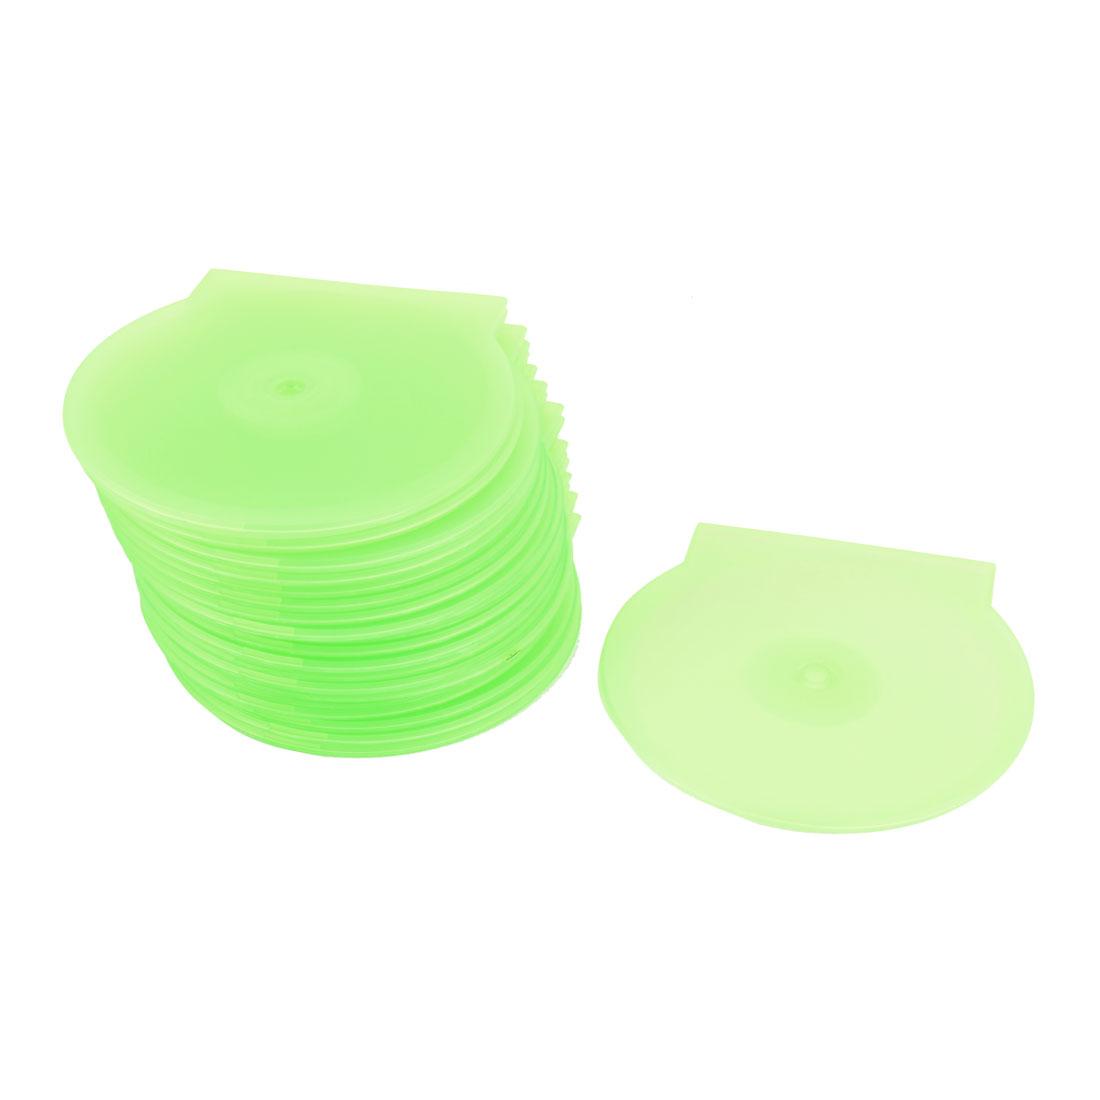 "Plastic DVD CD Box Storage Holder Green 4.8"" Dia 20pcs"